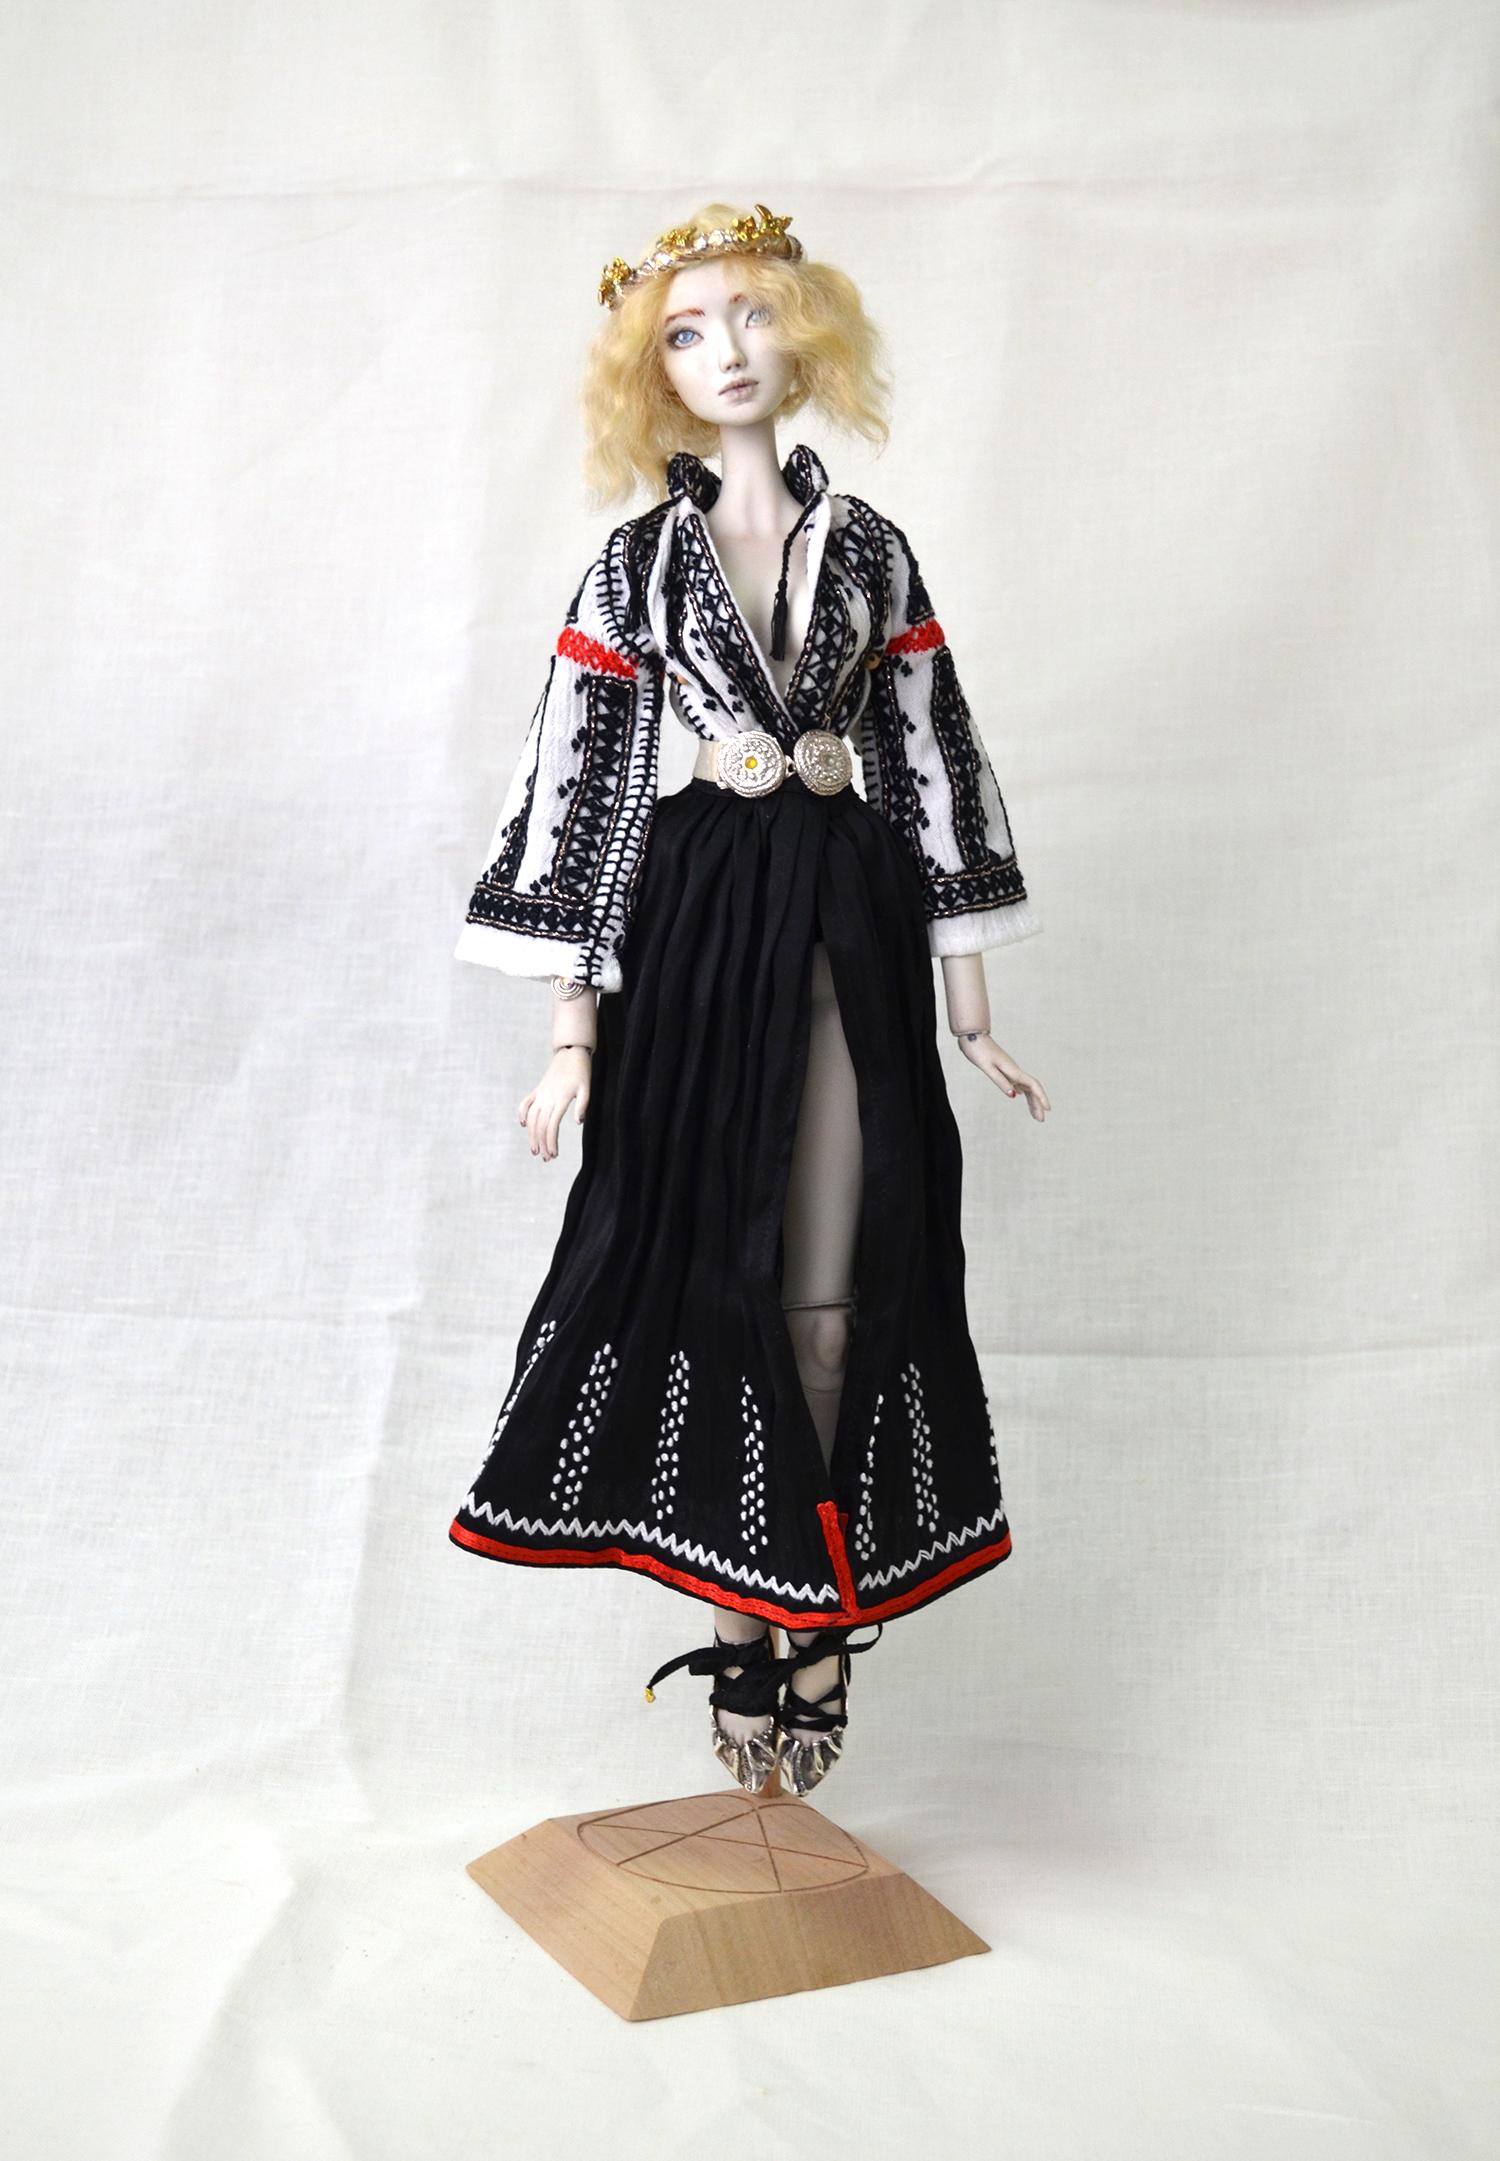 iulia-gorneanu-allistration-doll-3